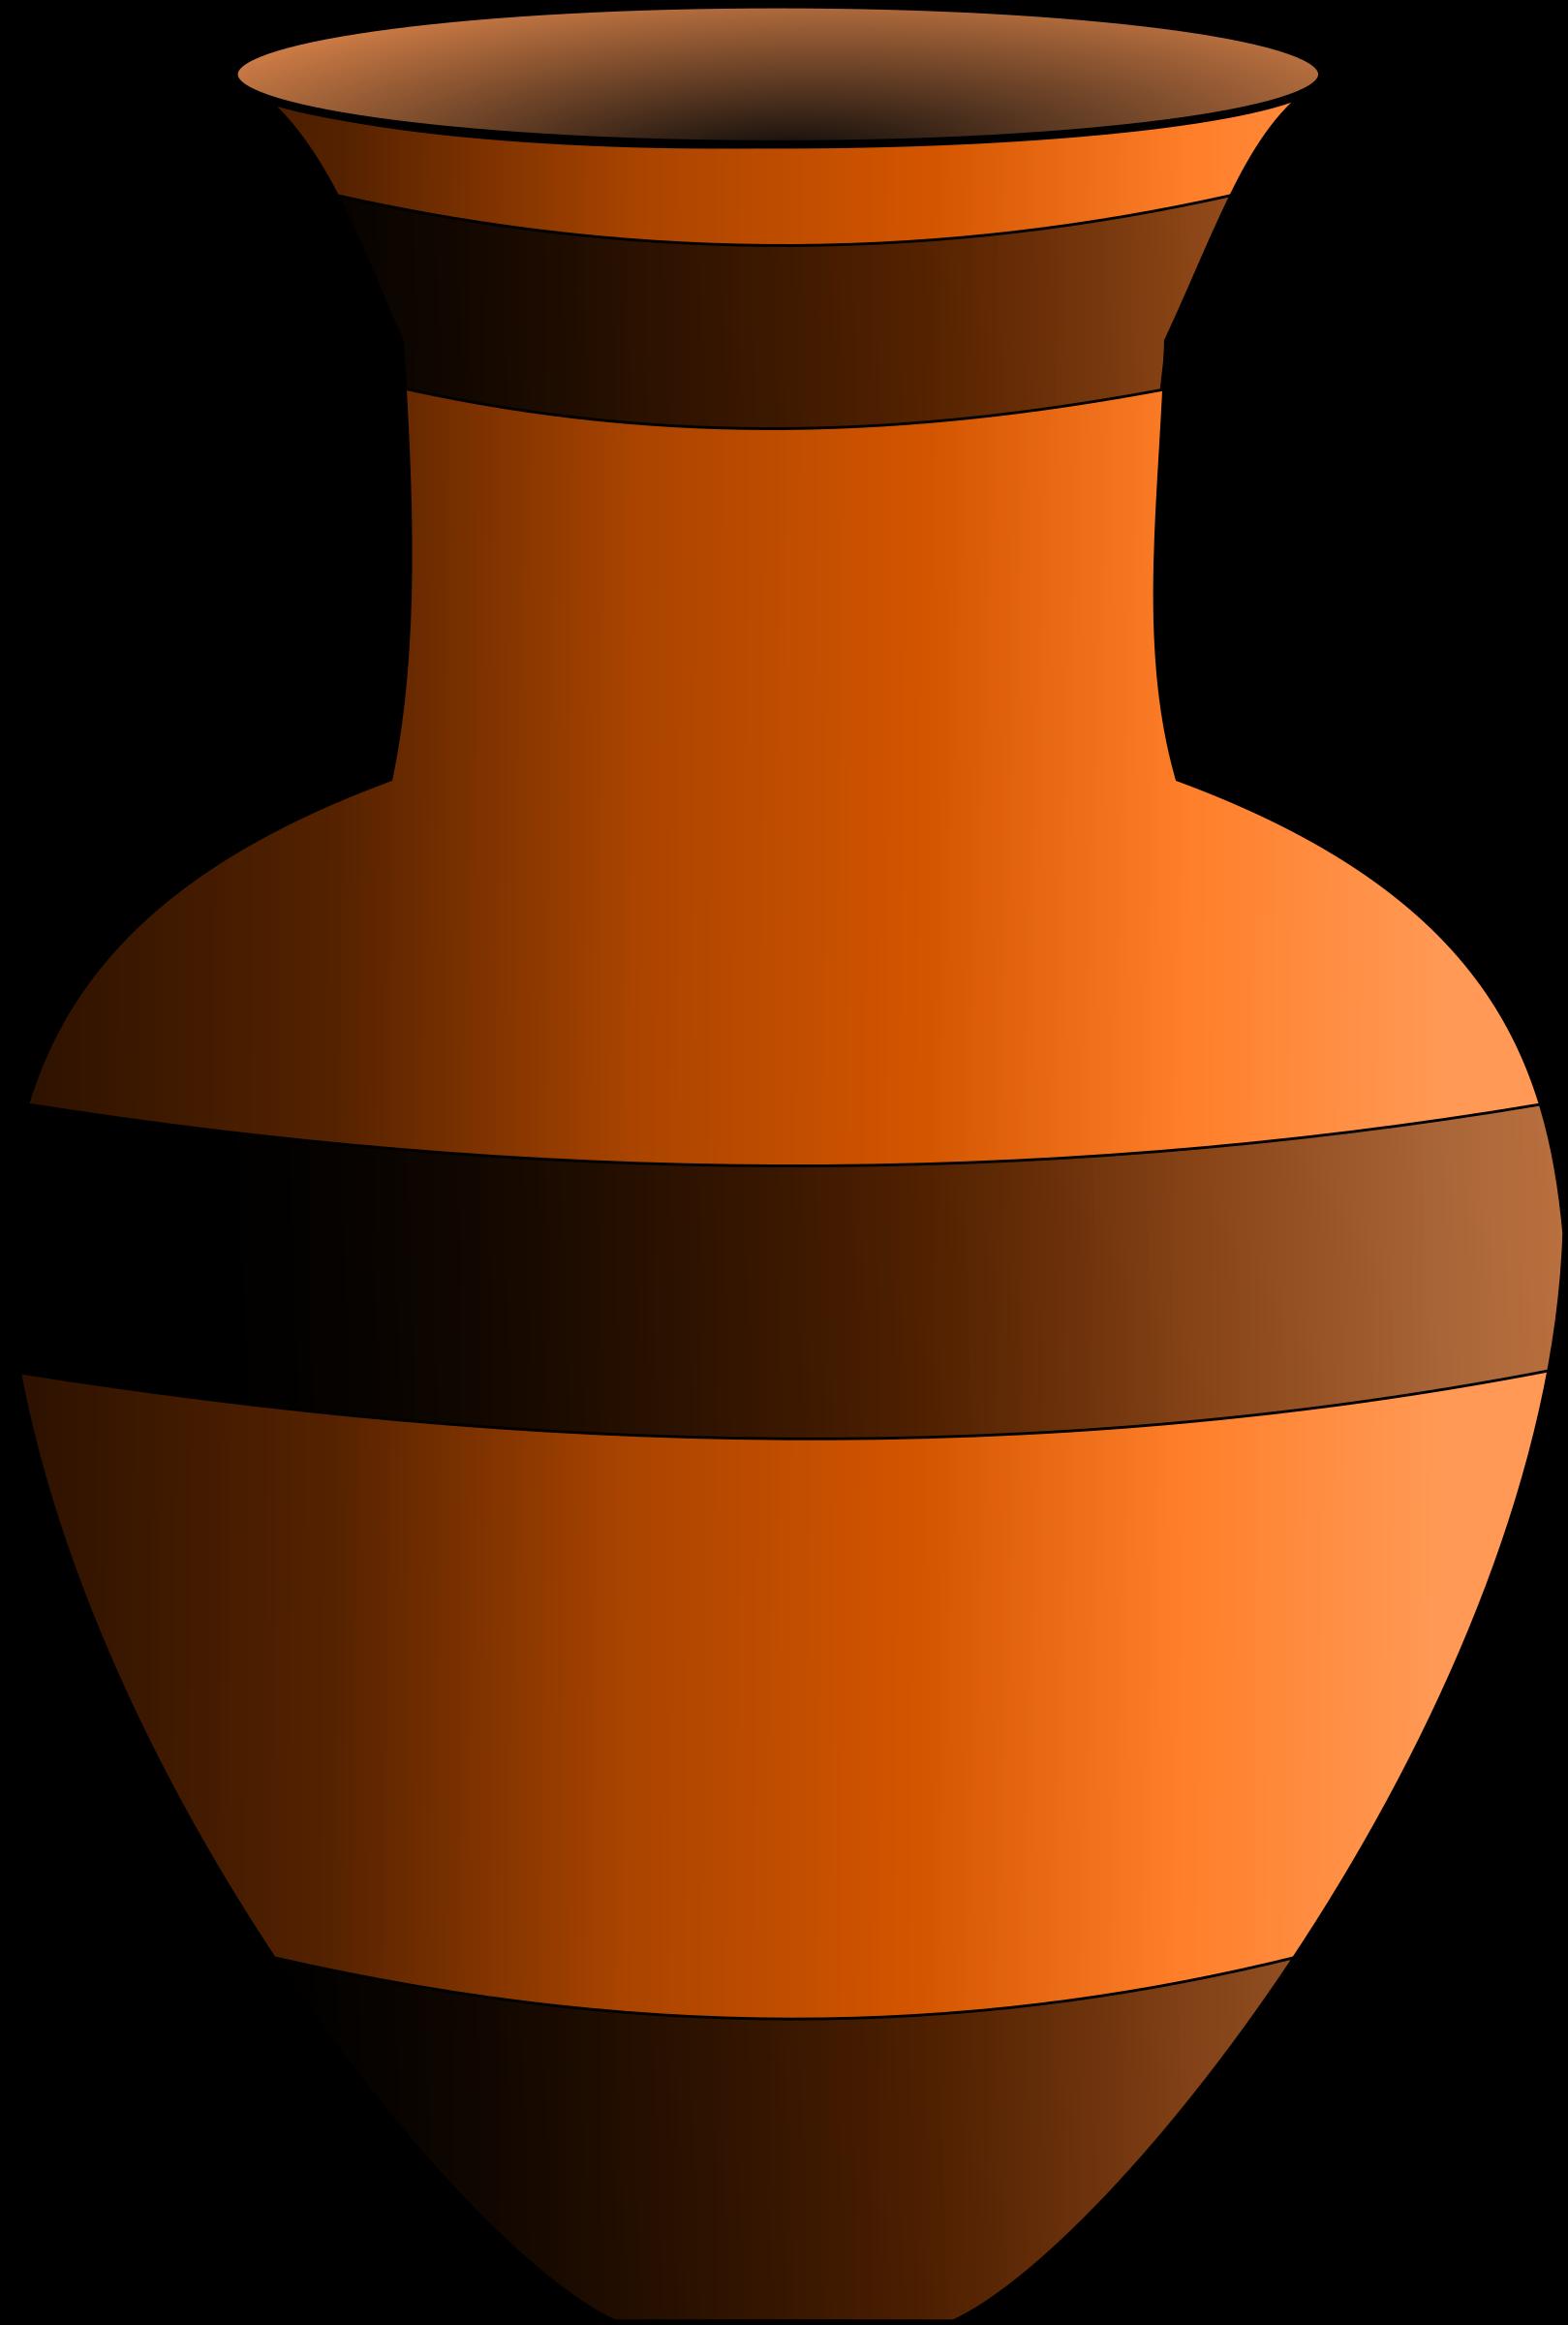 jpg transparent Vase clipart. Different free on dumielauxepices